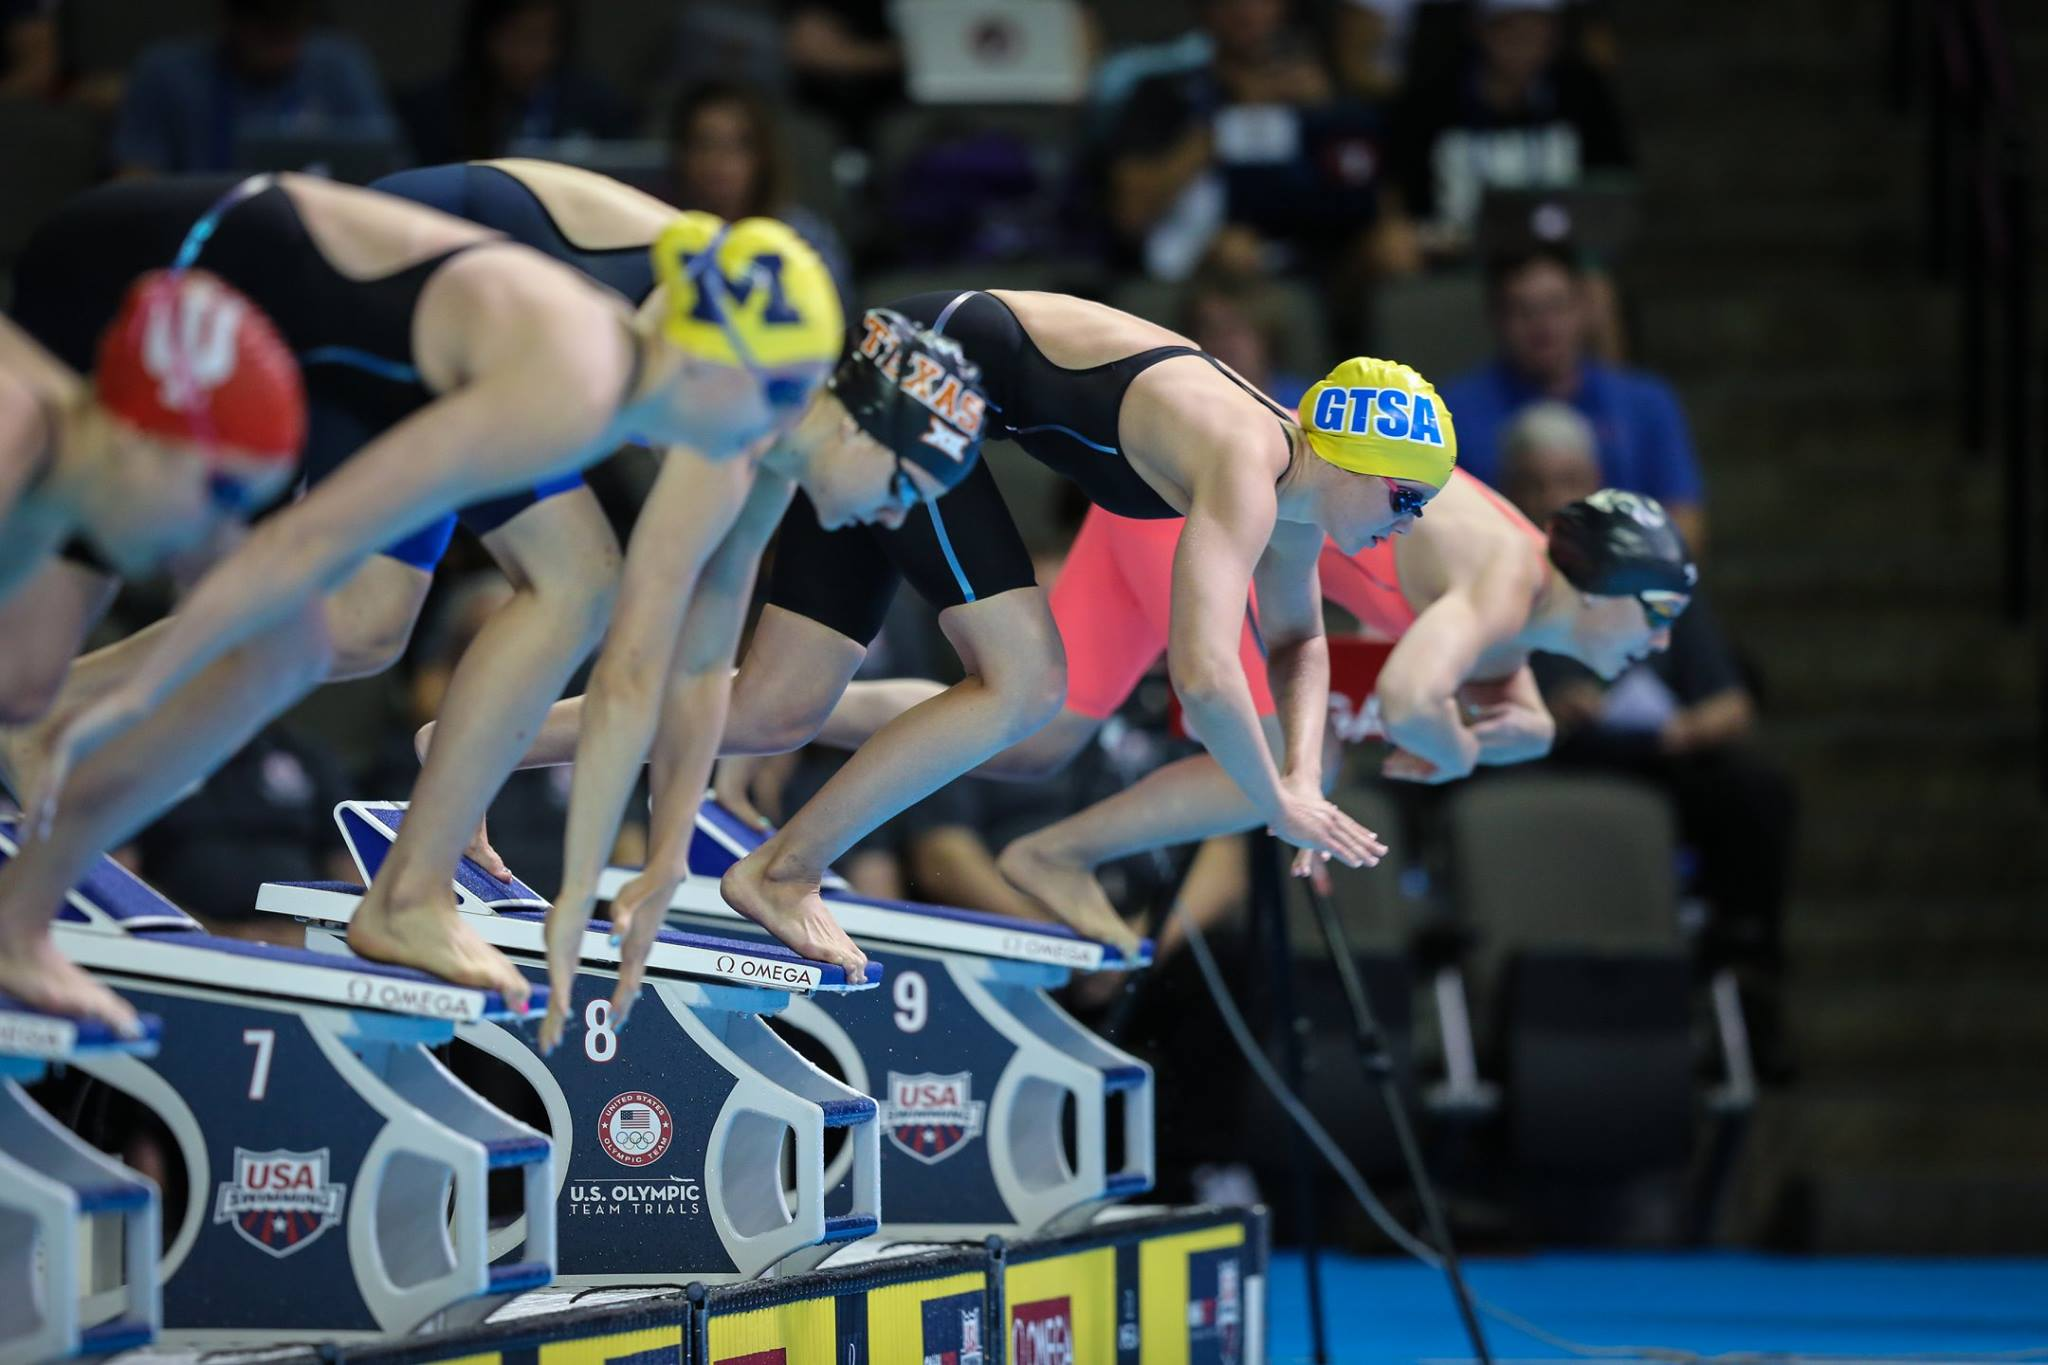 Then H.B. Plant High School swimmer Morgan Tankersley (GTSA) at the 2016 Olympic Trials. Photo: Michael C. Lyn for Florida Swim Network.